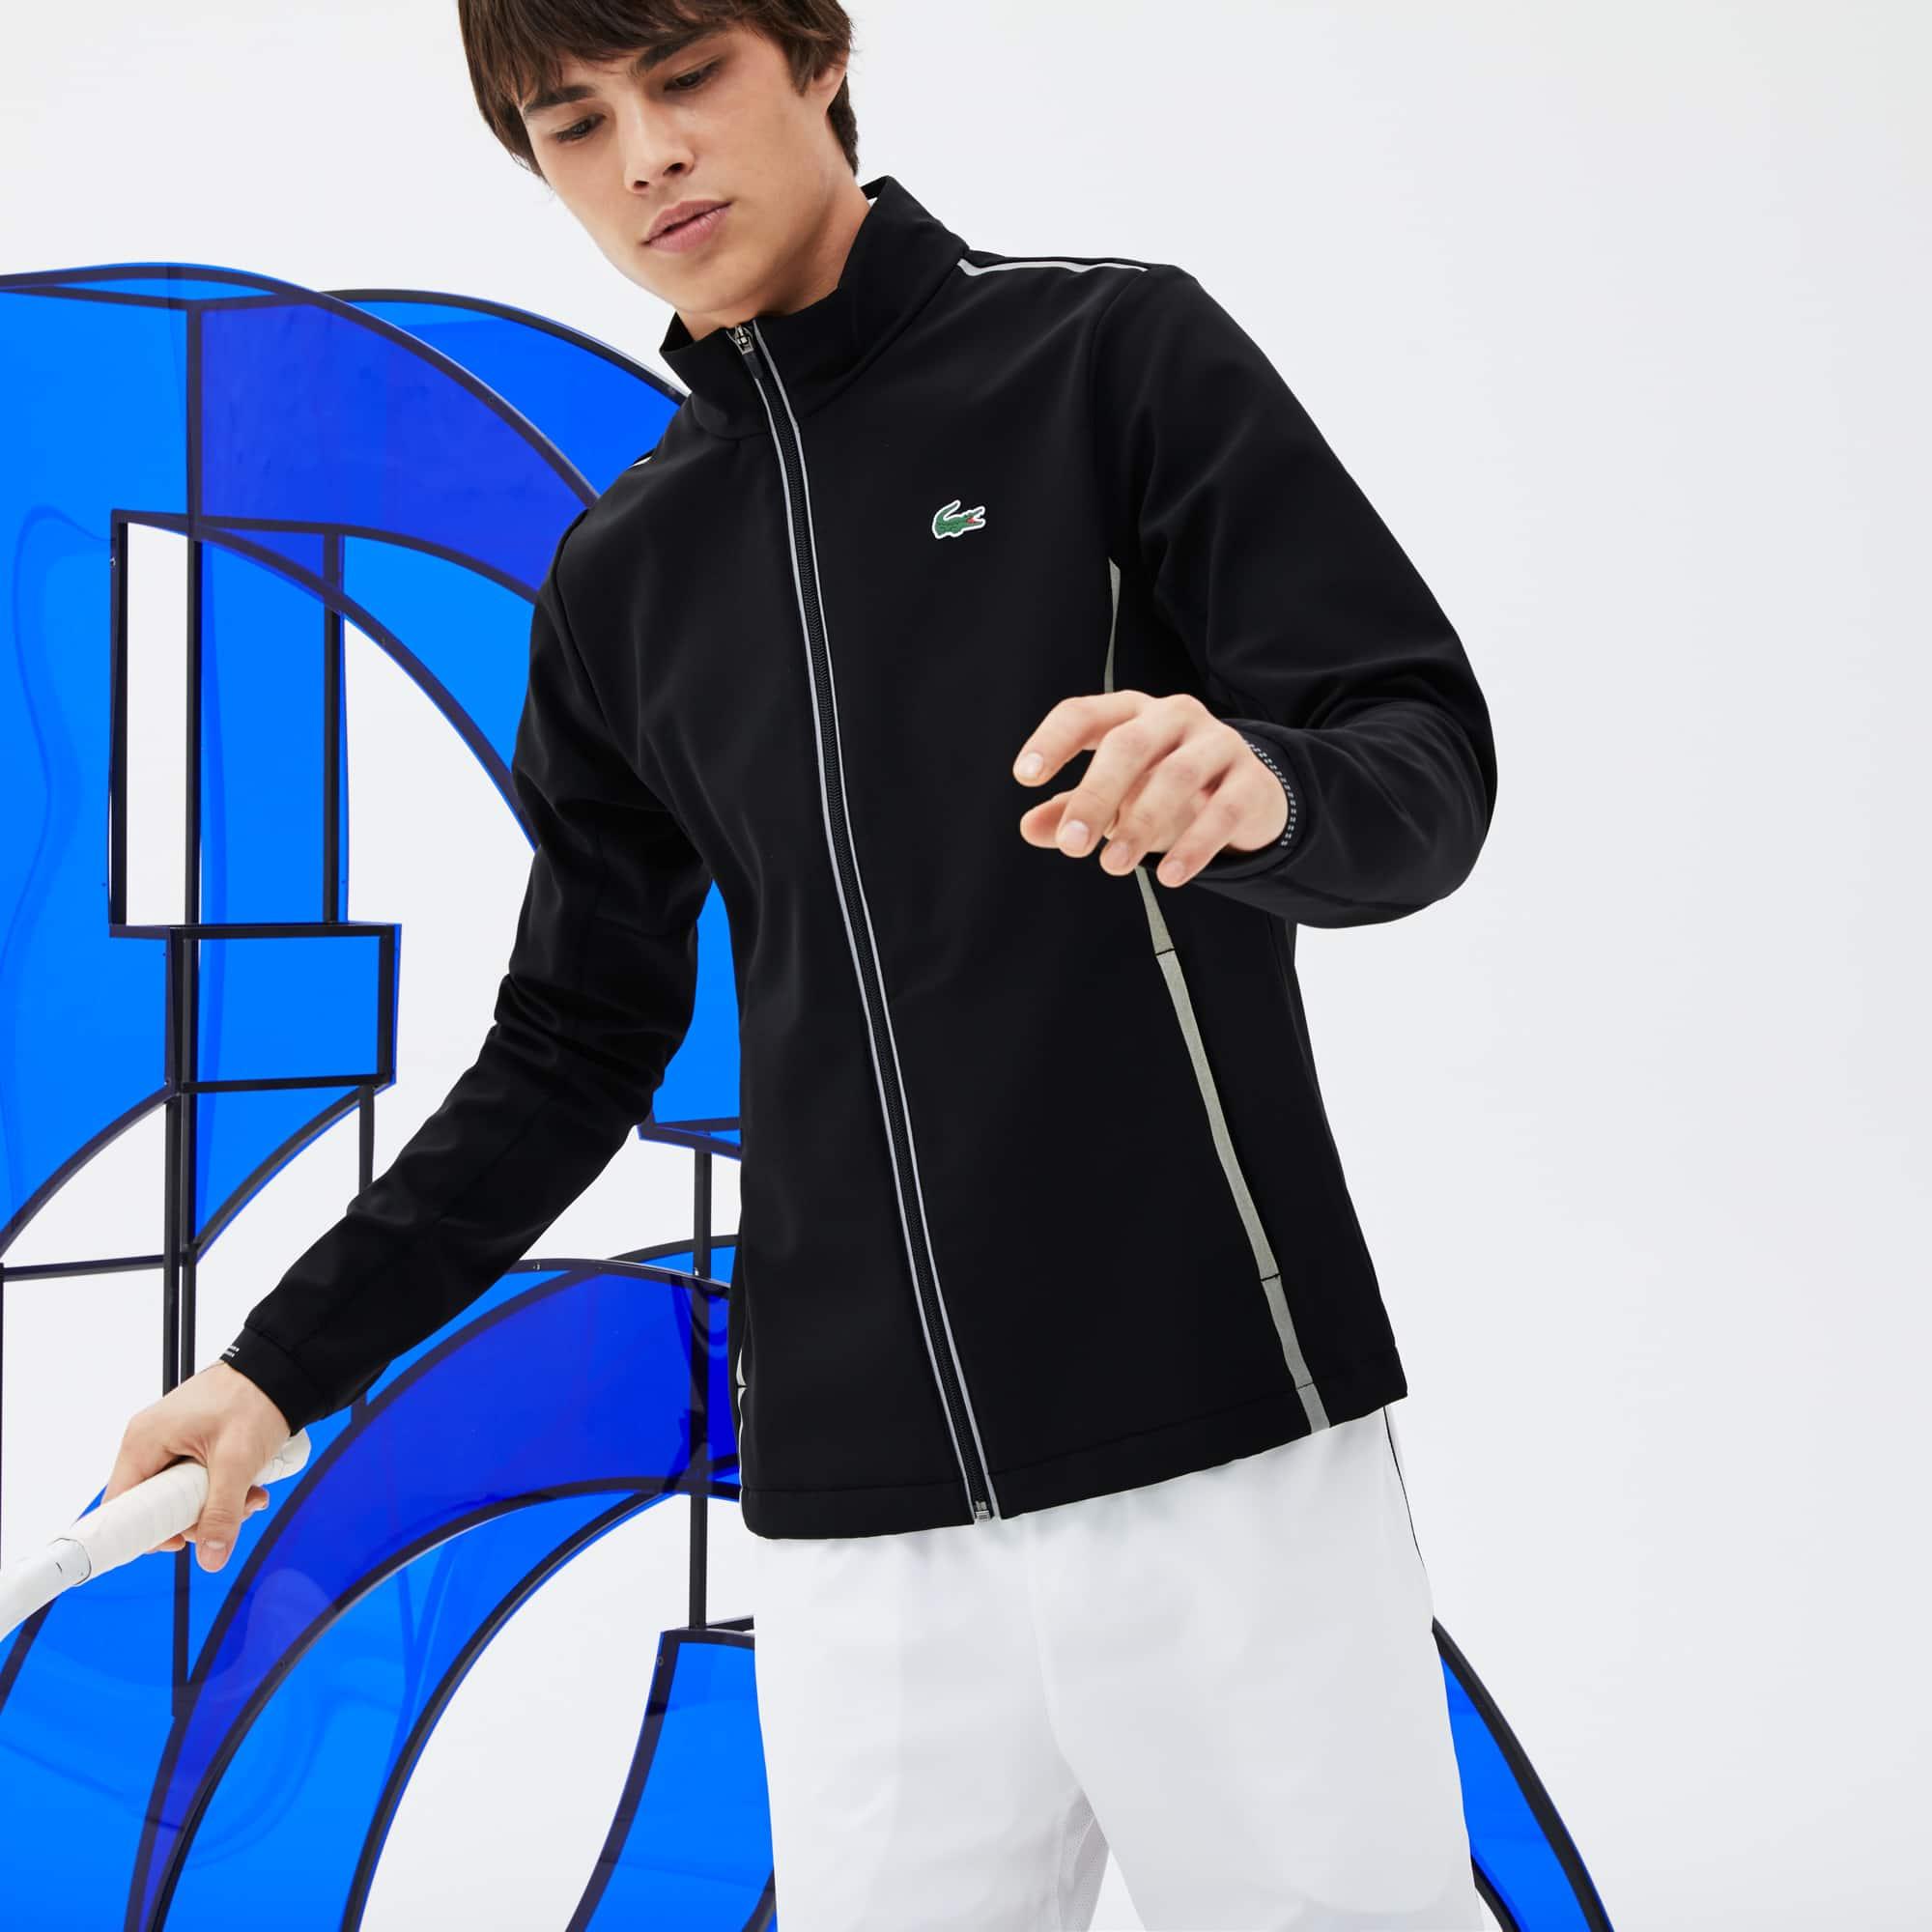 Sweatshirt zippé Lacoste SPORT COLLECTION NOVAK DJOKOVIC SUPPORT WITH STYLE en midlayer technique